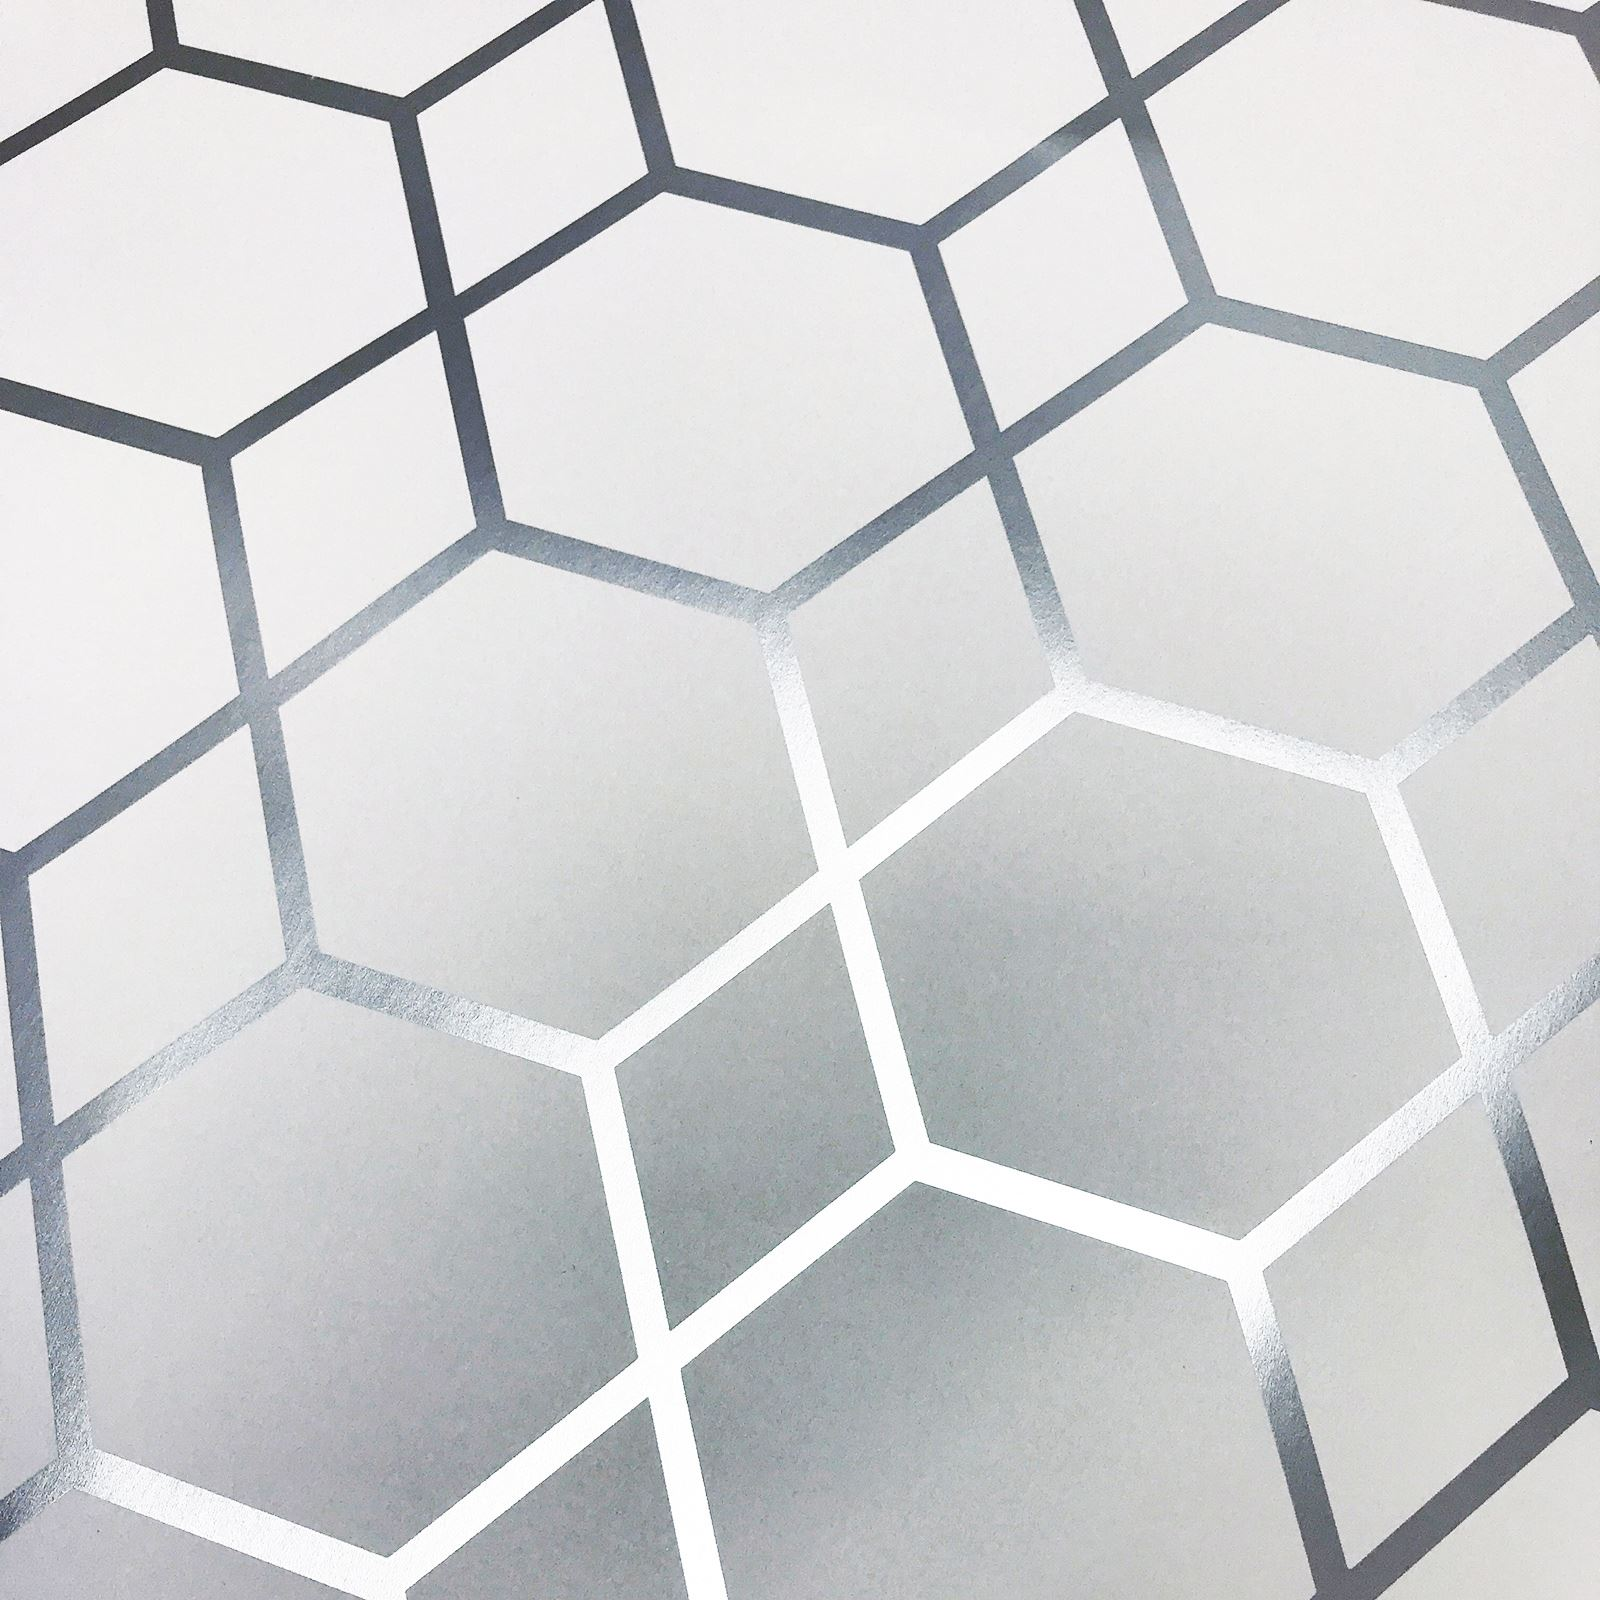 miniatura 28 - Carta da Parati Geometrica Arredamento Camera Moderno Vari Disegni e Colori